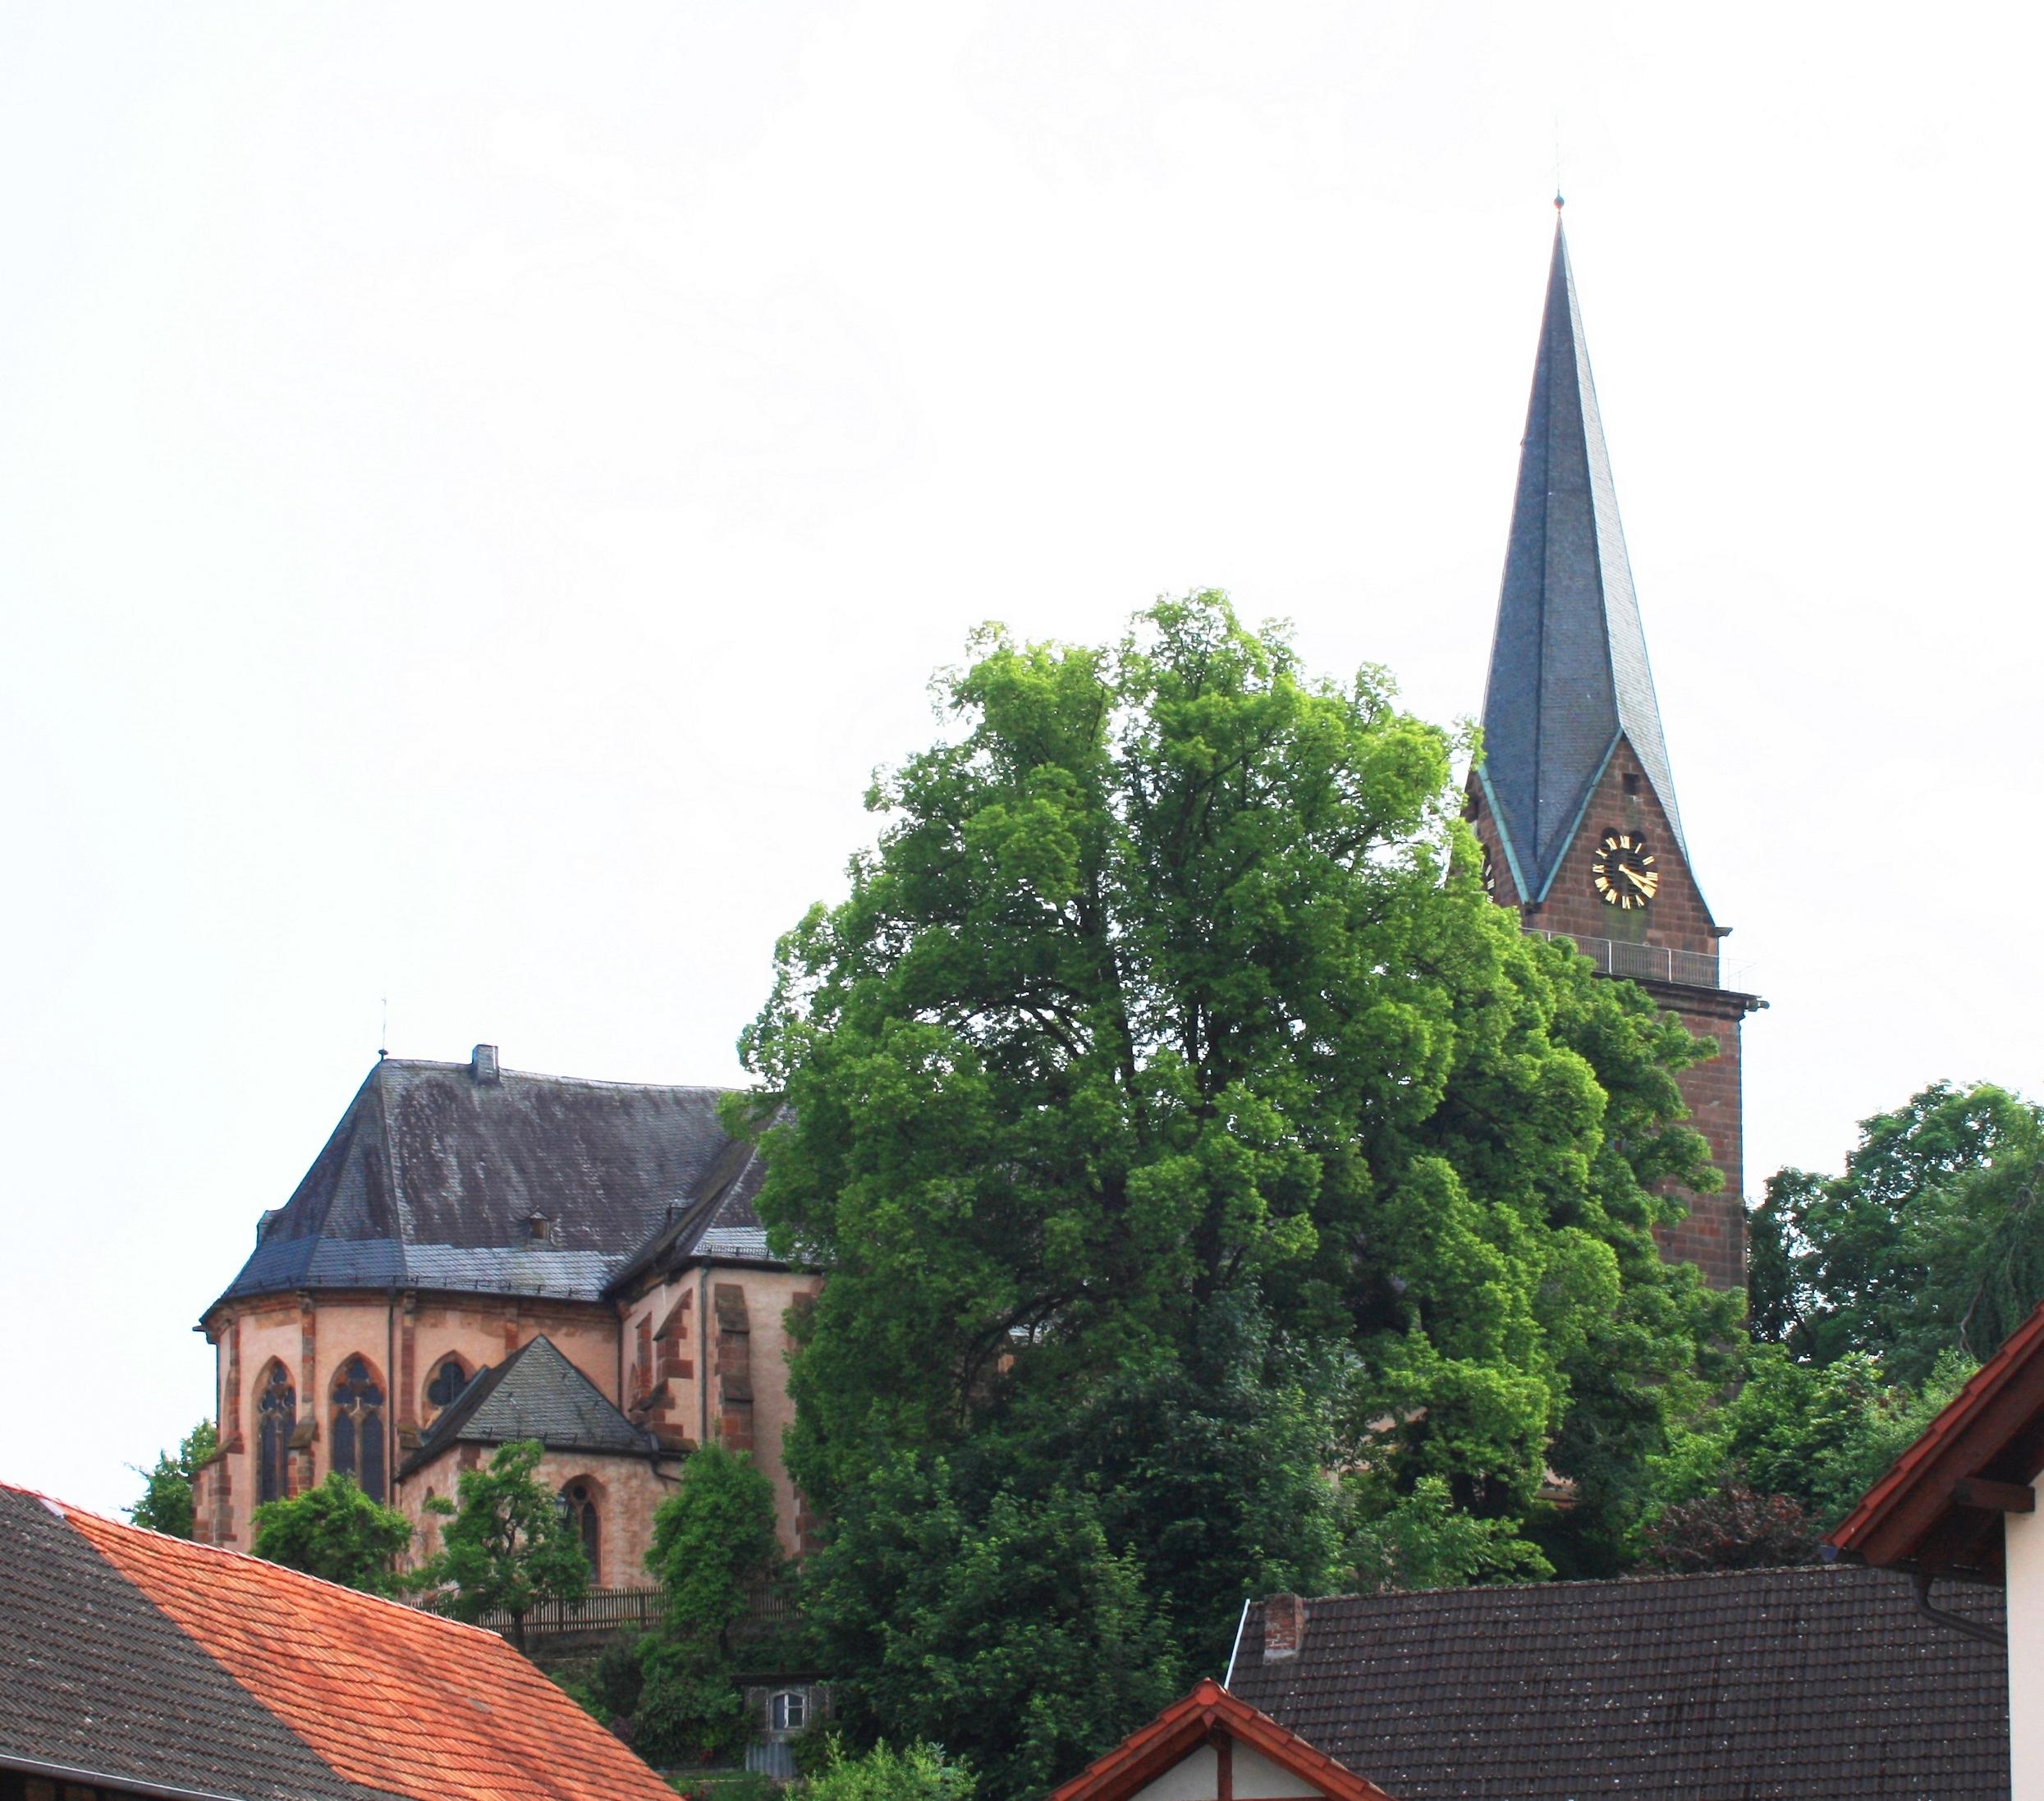 Wetter (Hessen)